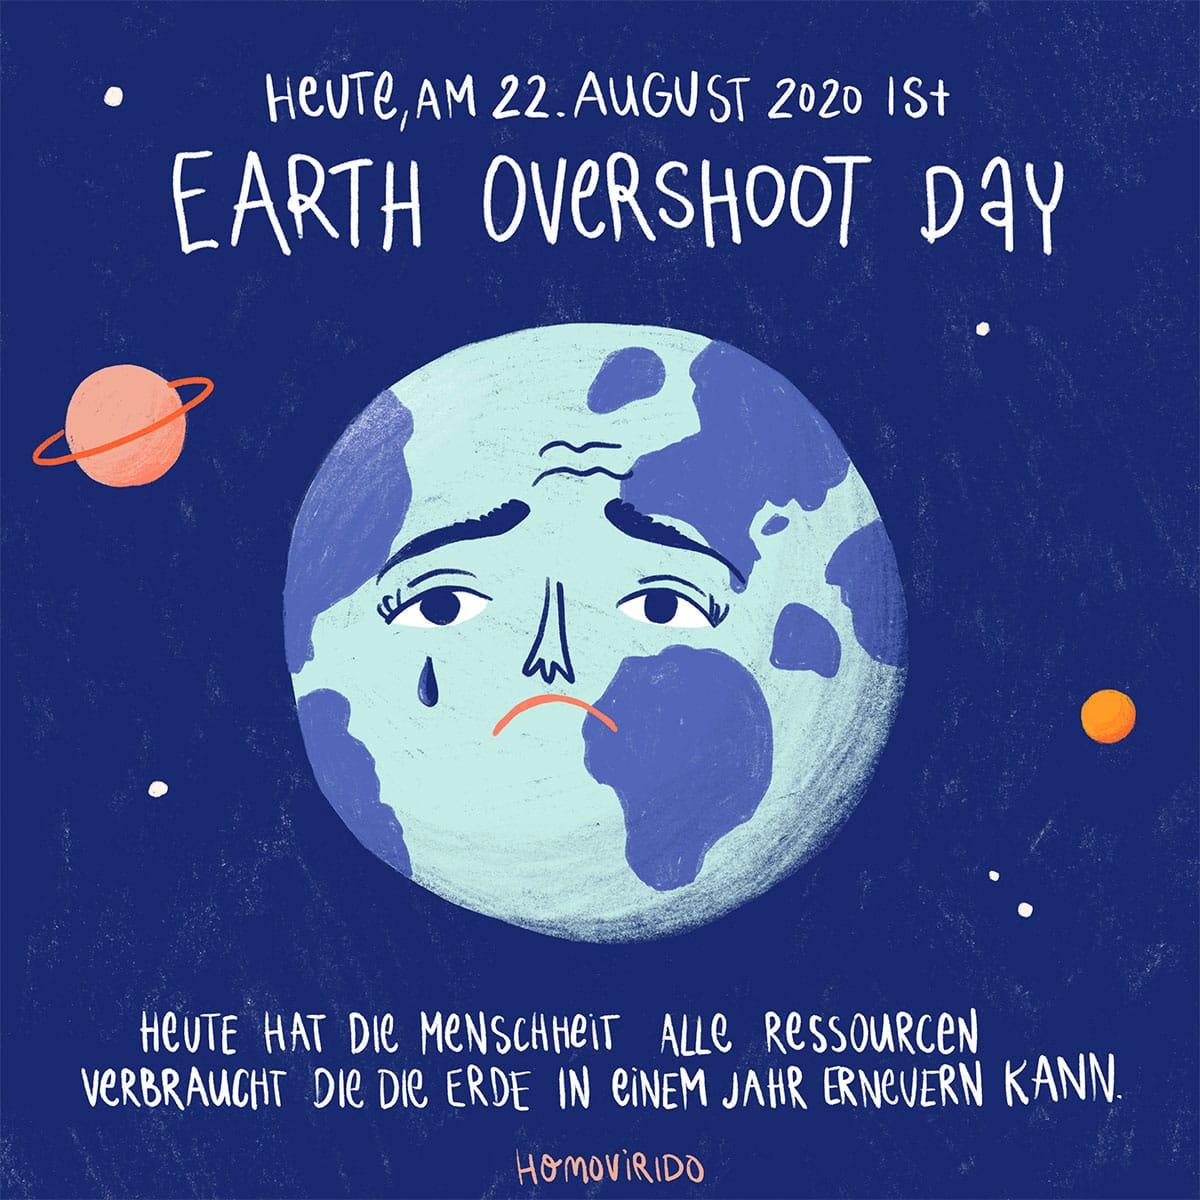 PetraHollaender_Earth_Overshoot_Day